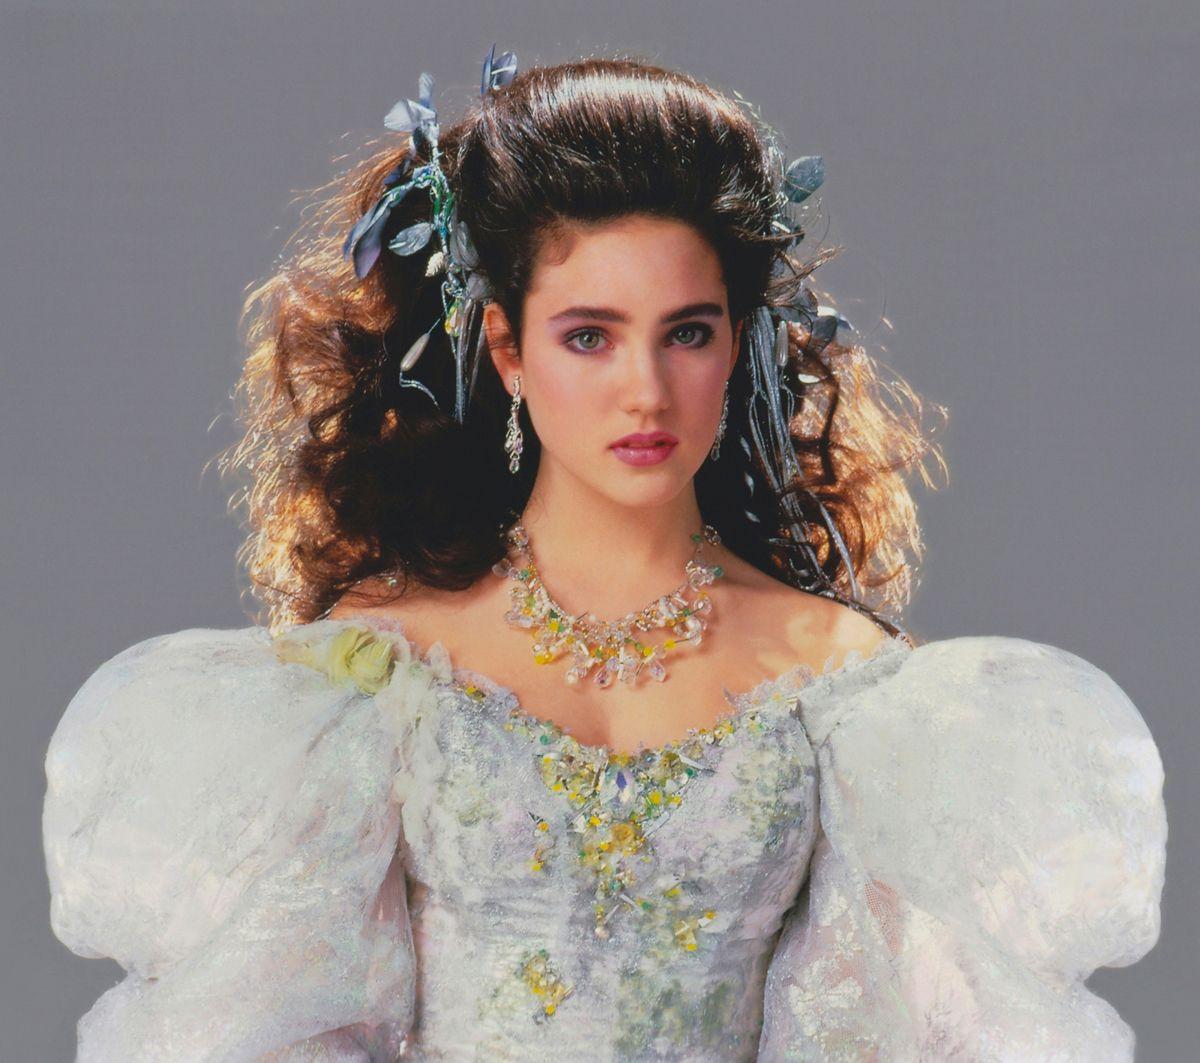 sarahs dress labyrinth | wedding dress after sarah s ... Labyrinth 1986 Sarah